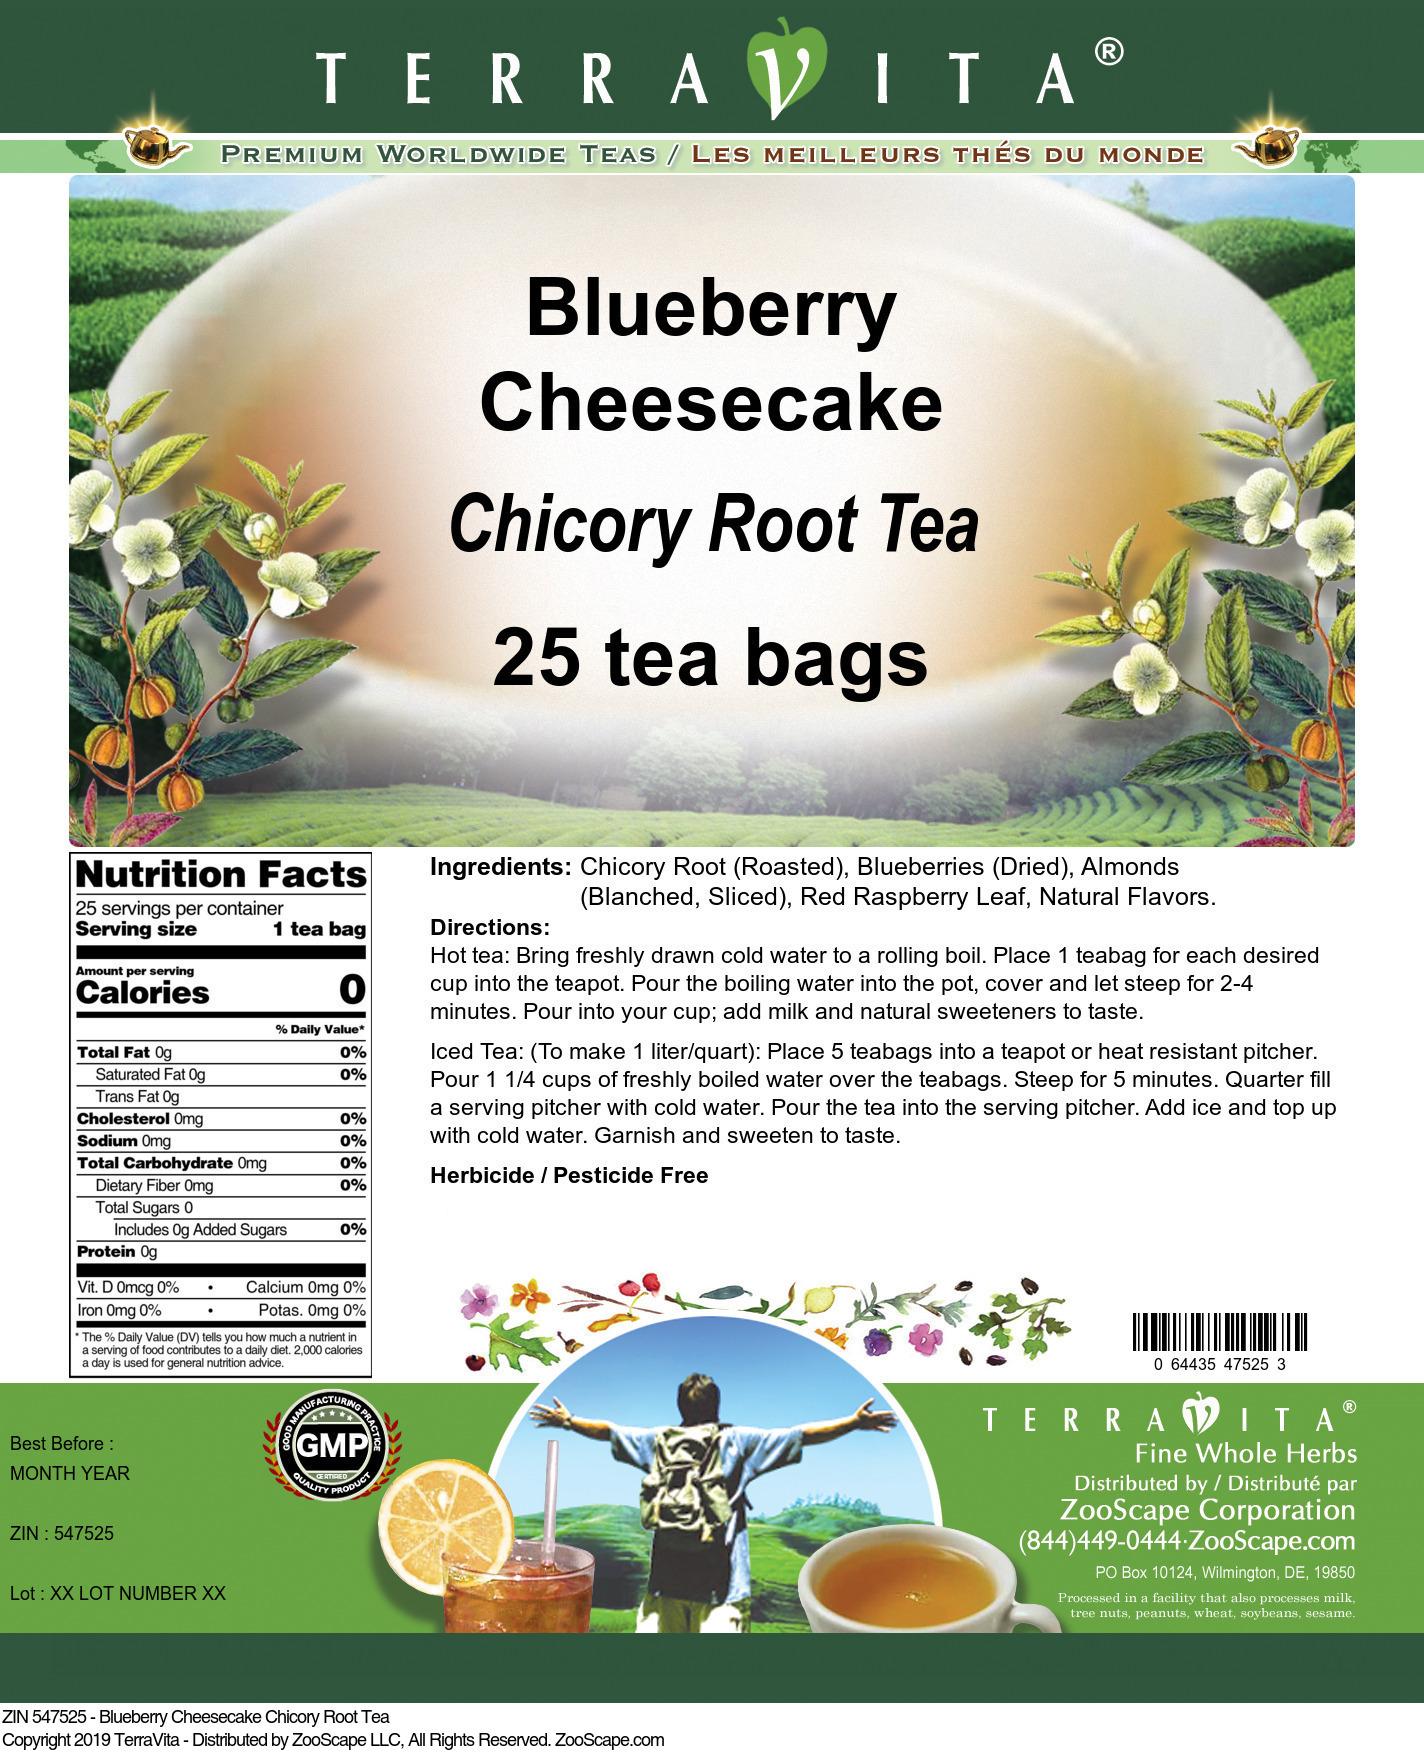 Blueberry Cheesecake Chicory Root Tea